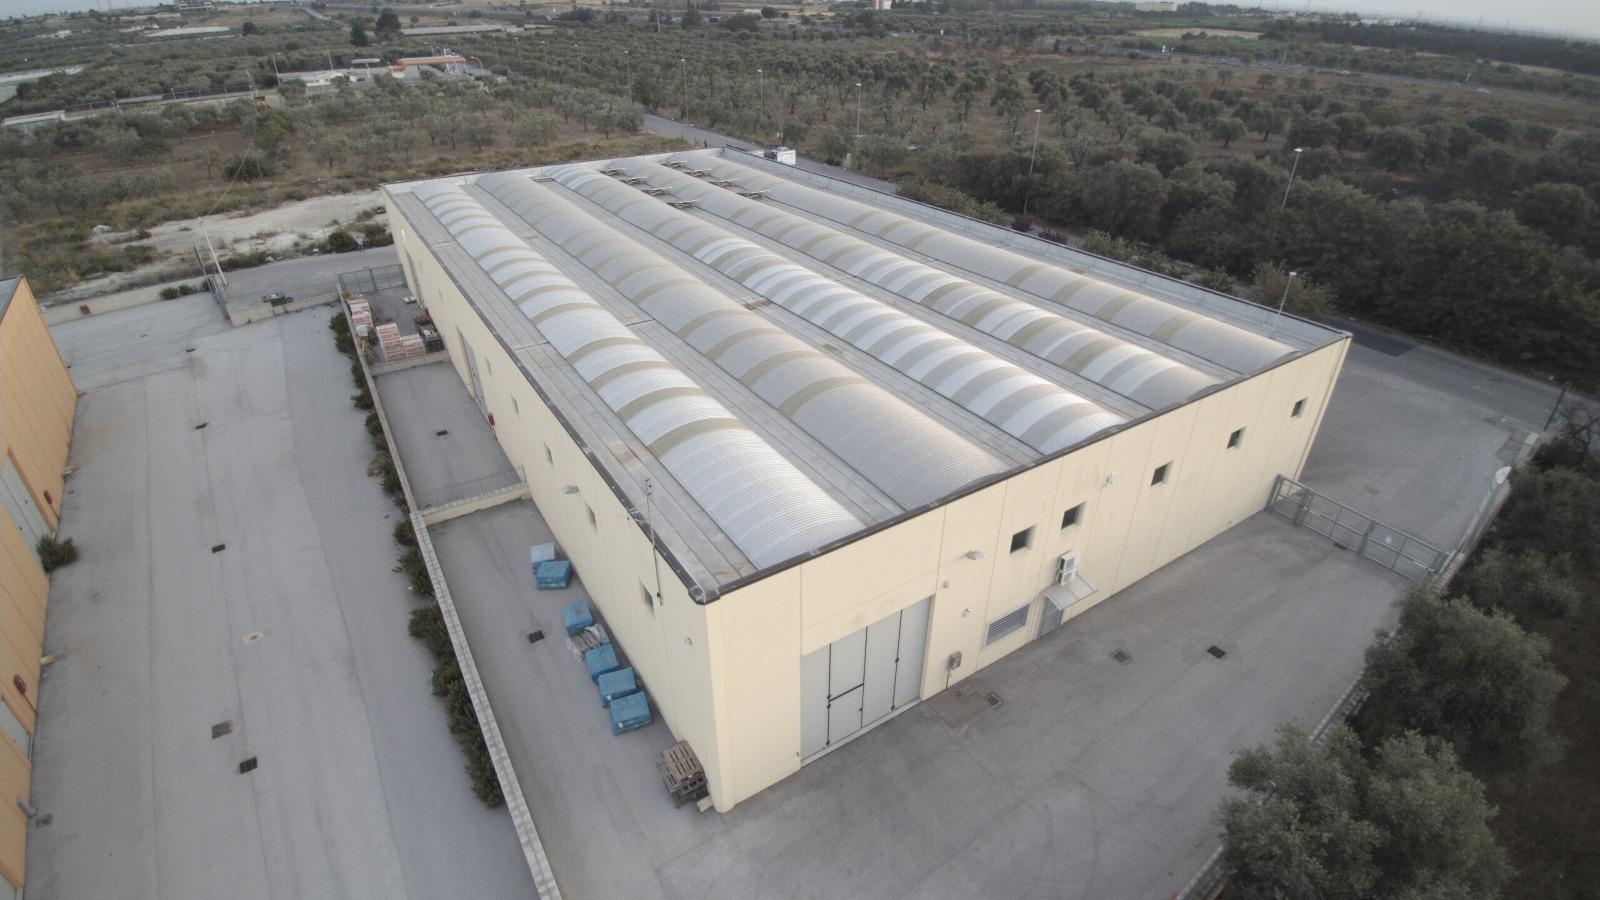 capannoni-industriali-pepe-a-bari-4